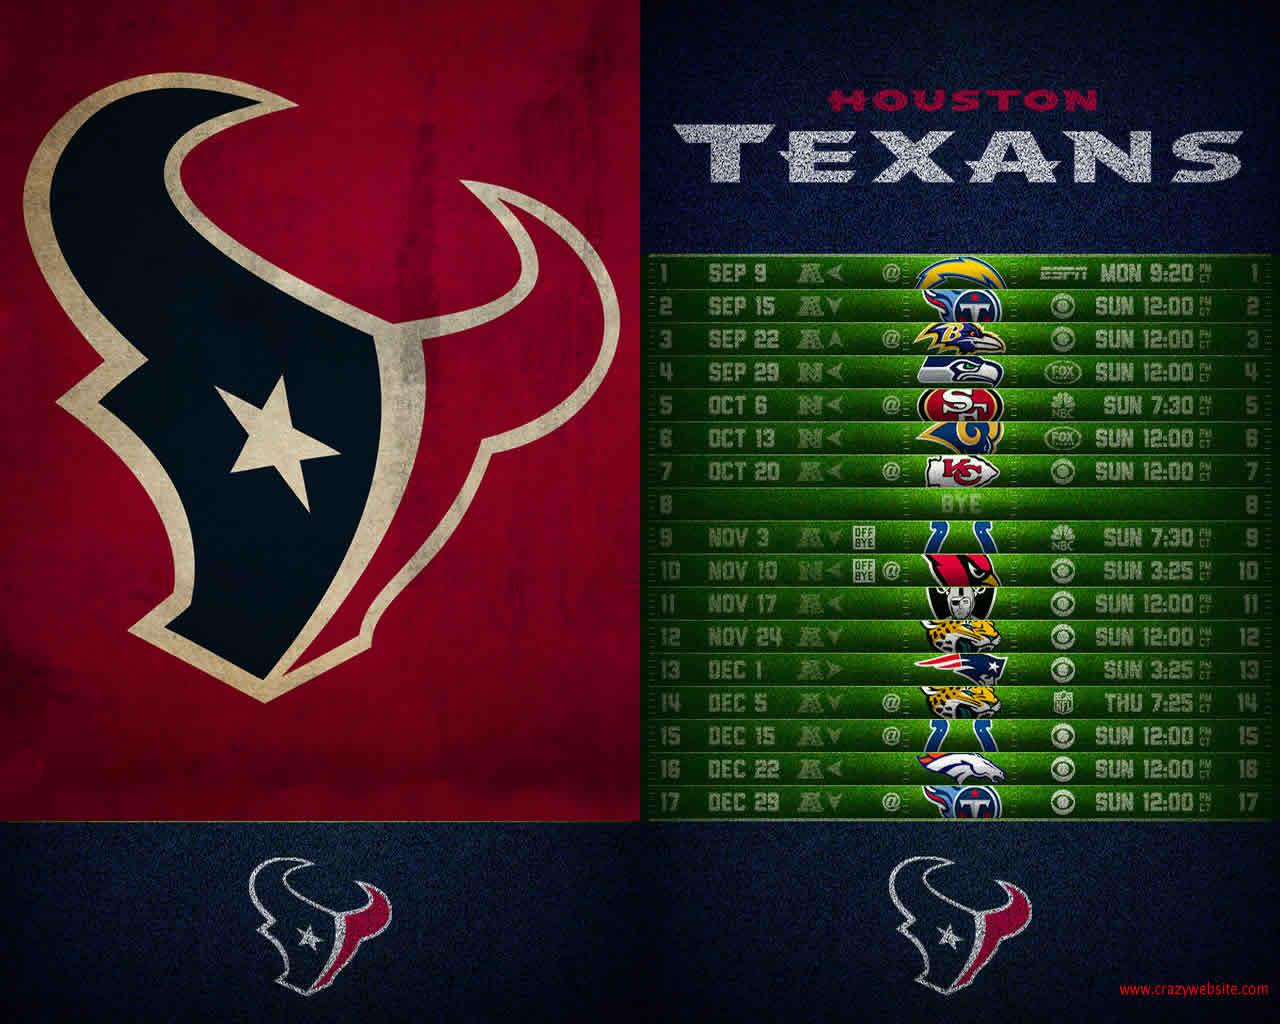 Houston Texans Wallpapers 2016 Wallpaper Cave